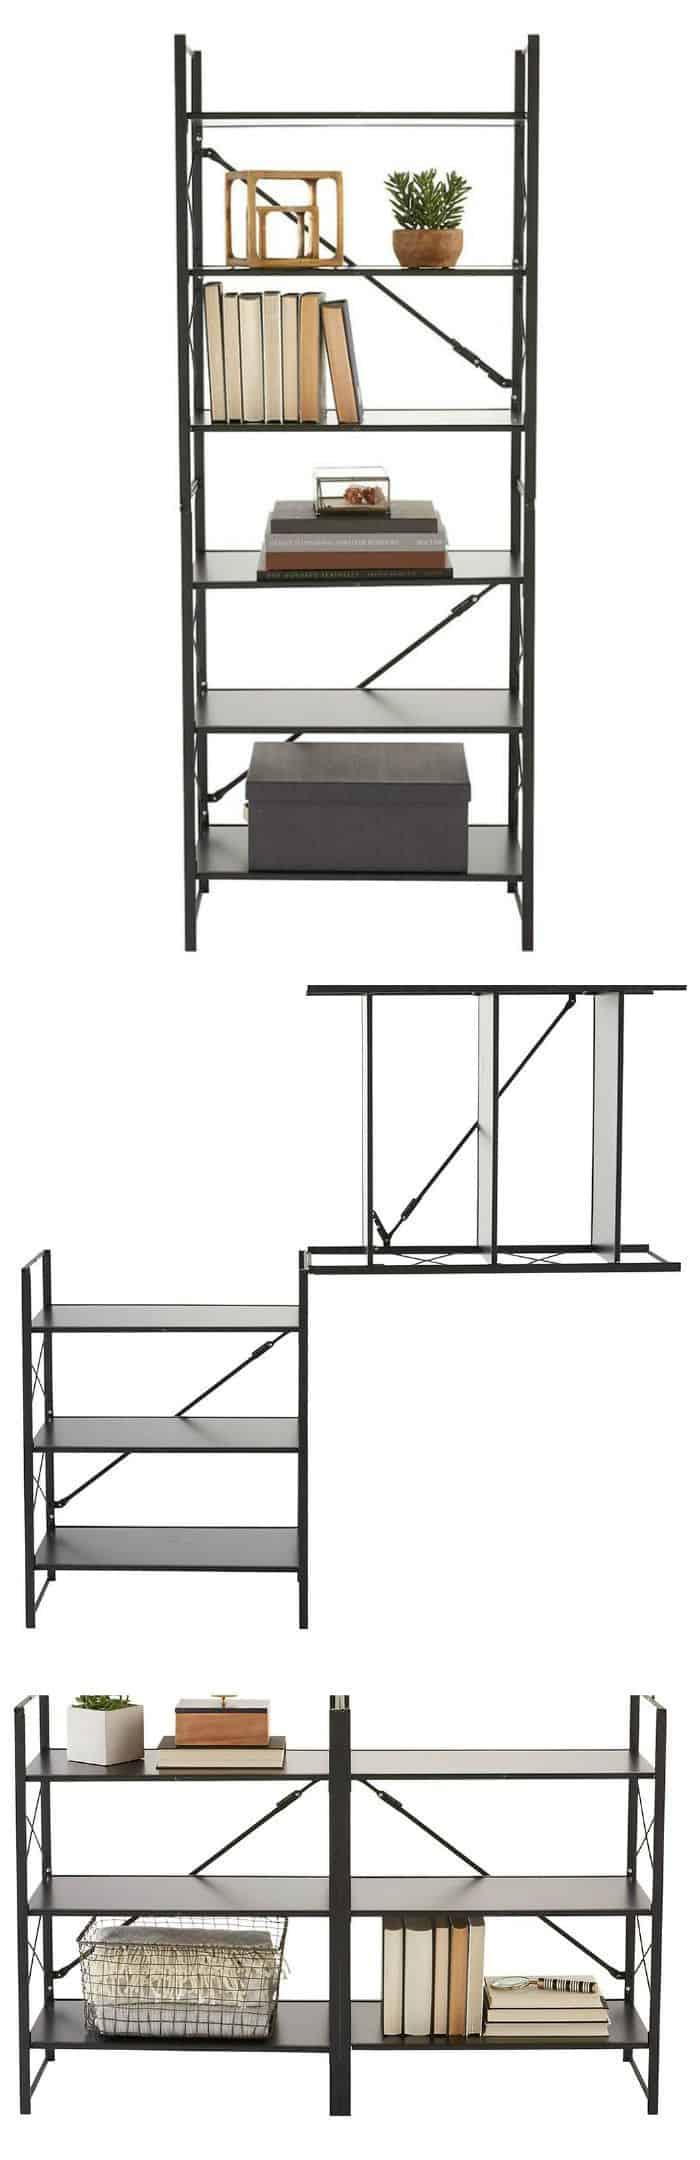 folding shelf space saver